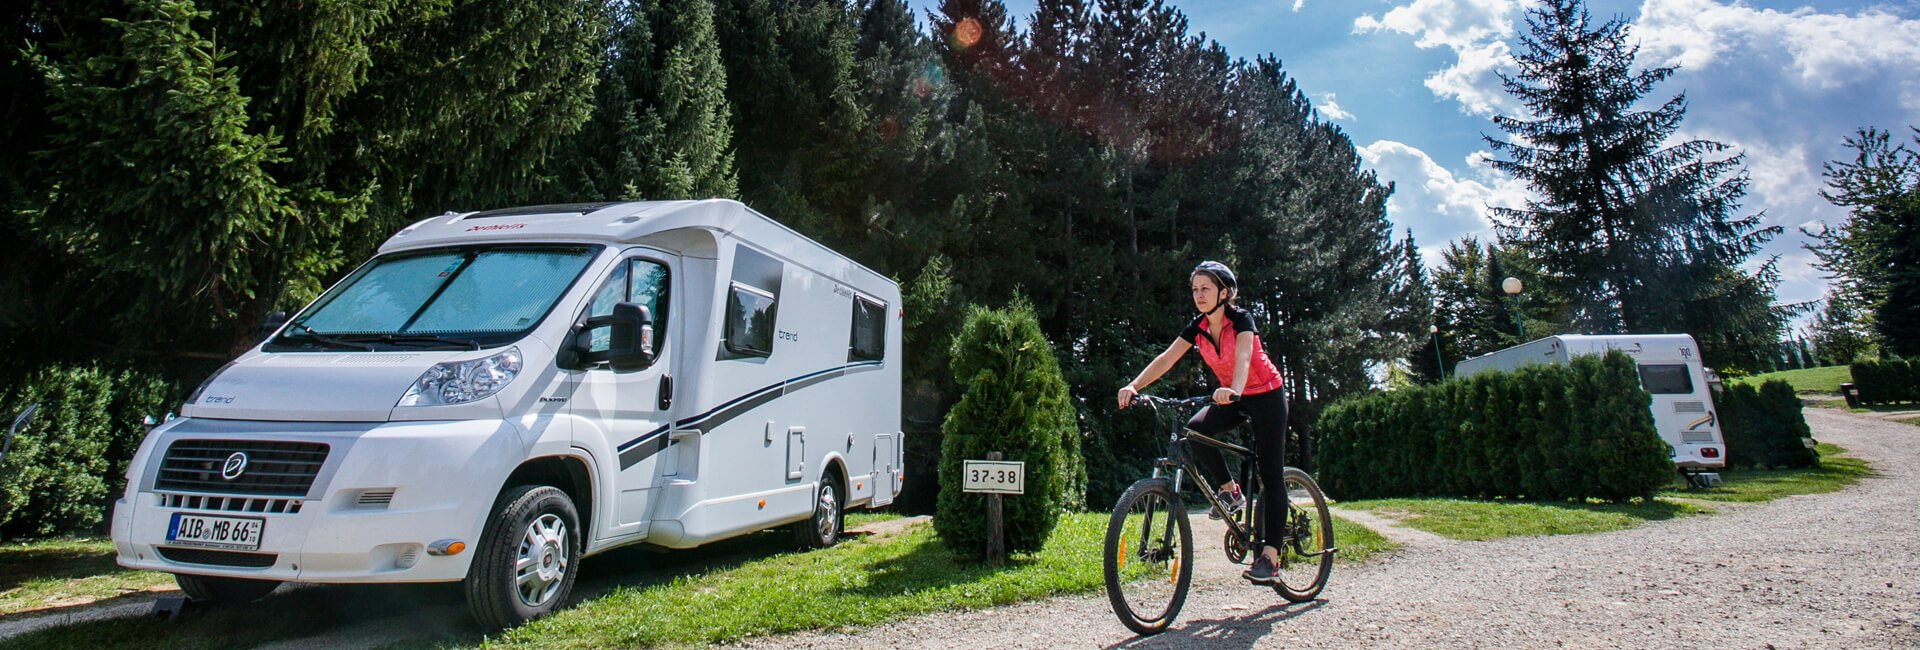 Camping Turist Grabovac